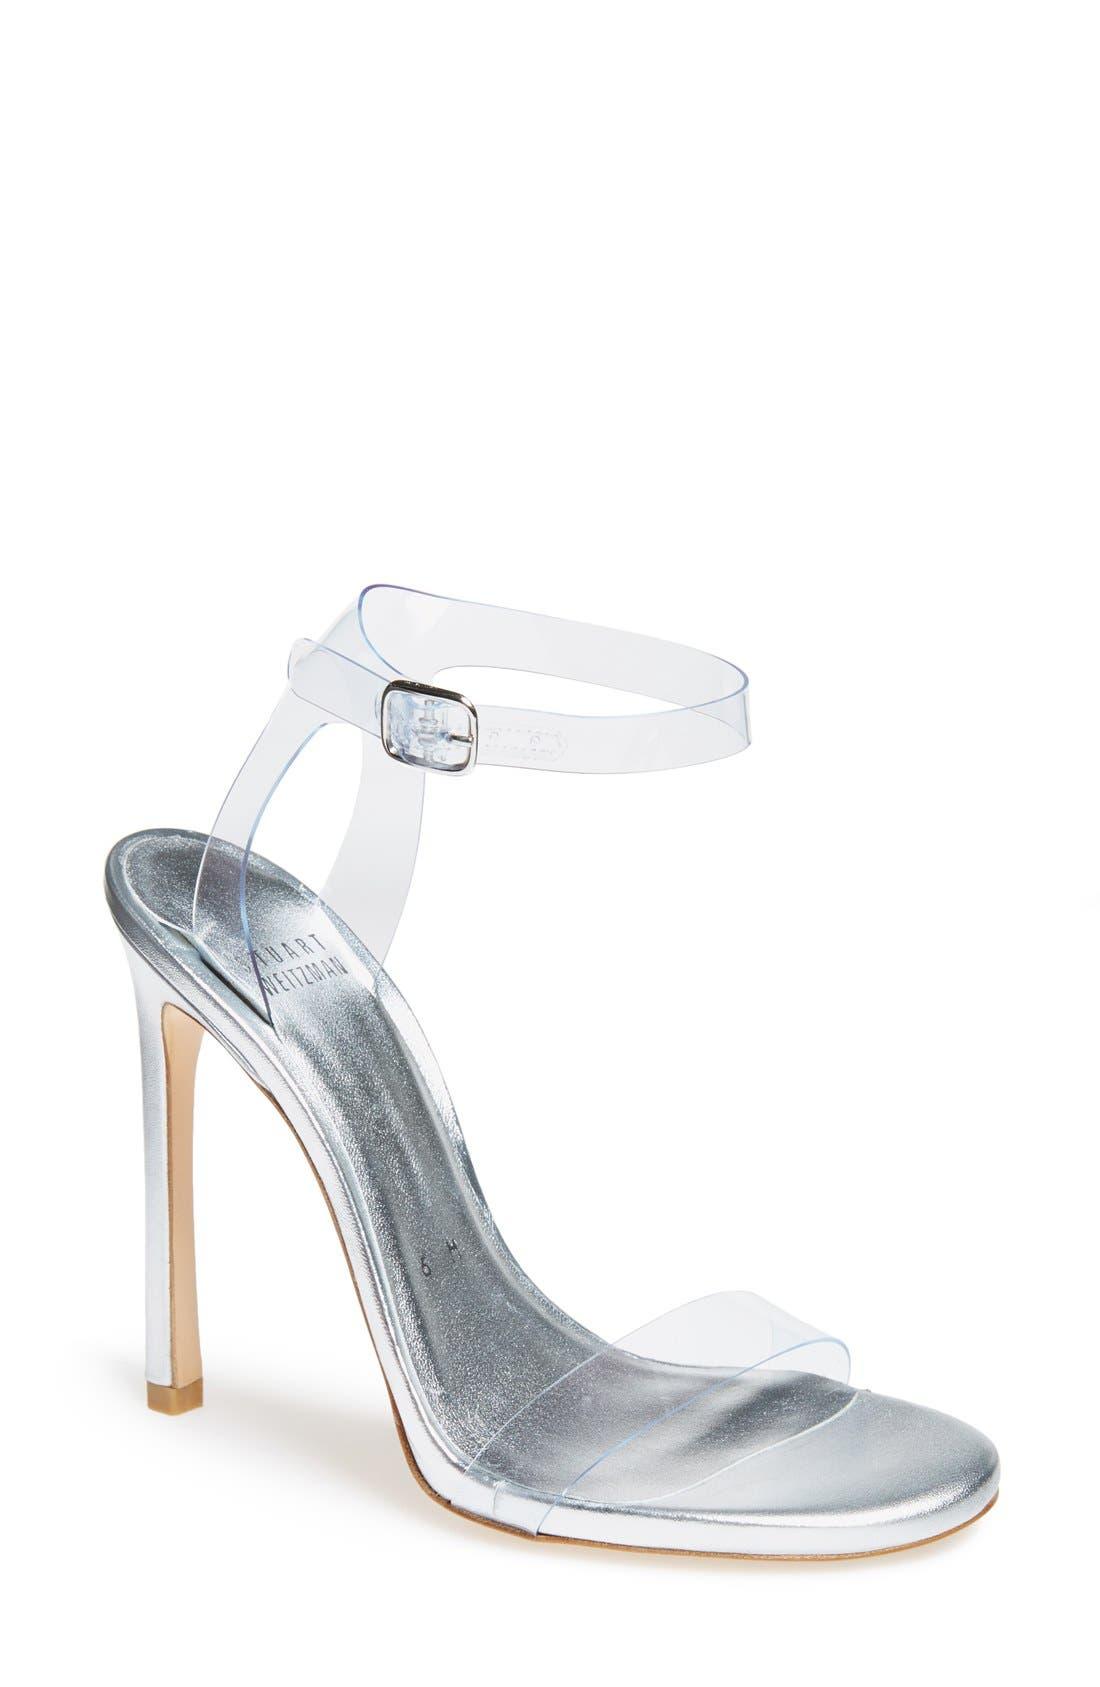 Main Image - Stuart Weitzman 'Bareitall' Translucent Strap Sandal (Women)